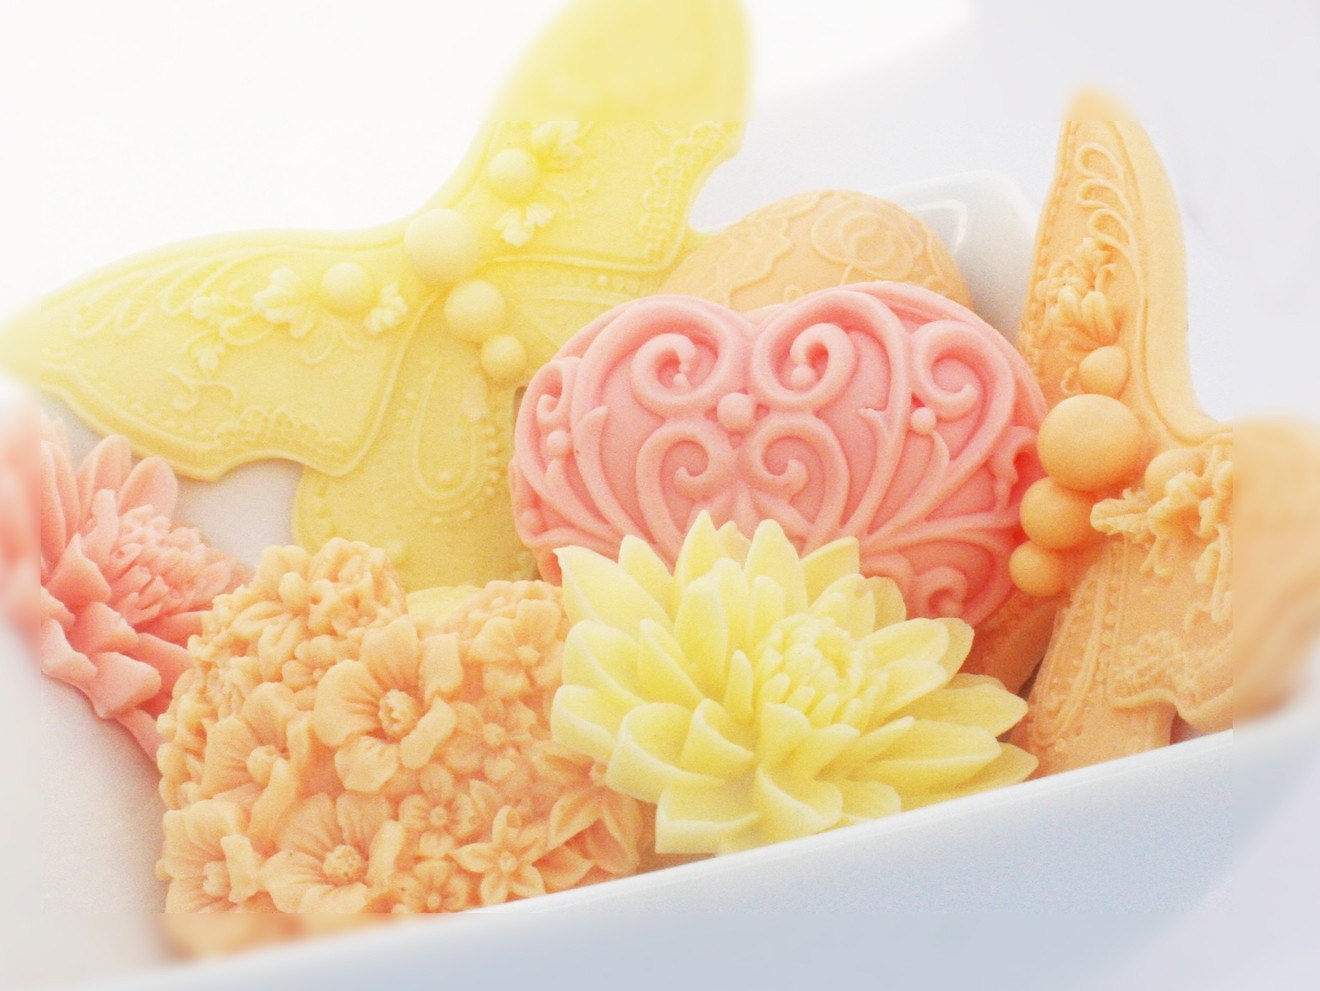 Mother's Day Gift Decorative Soap Hostess Gift Soap Butterfly Soap Heart Soap Vegan Pink, Yellow Gift Set - SakuraBathAndBody